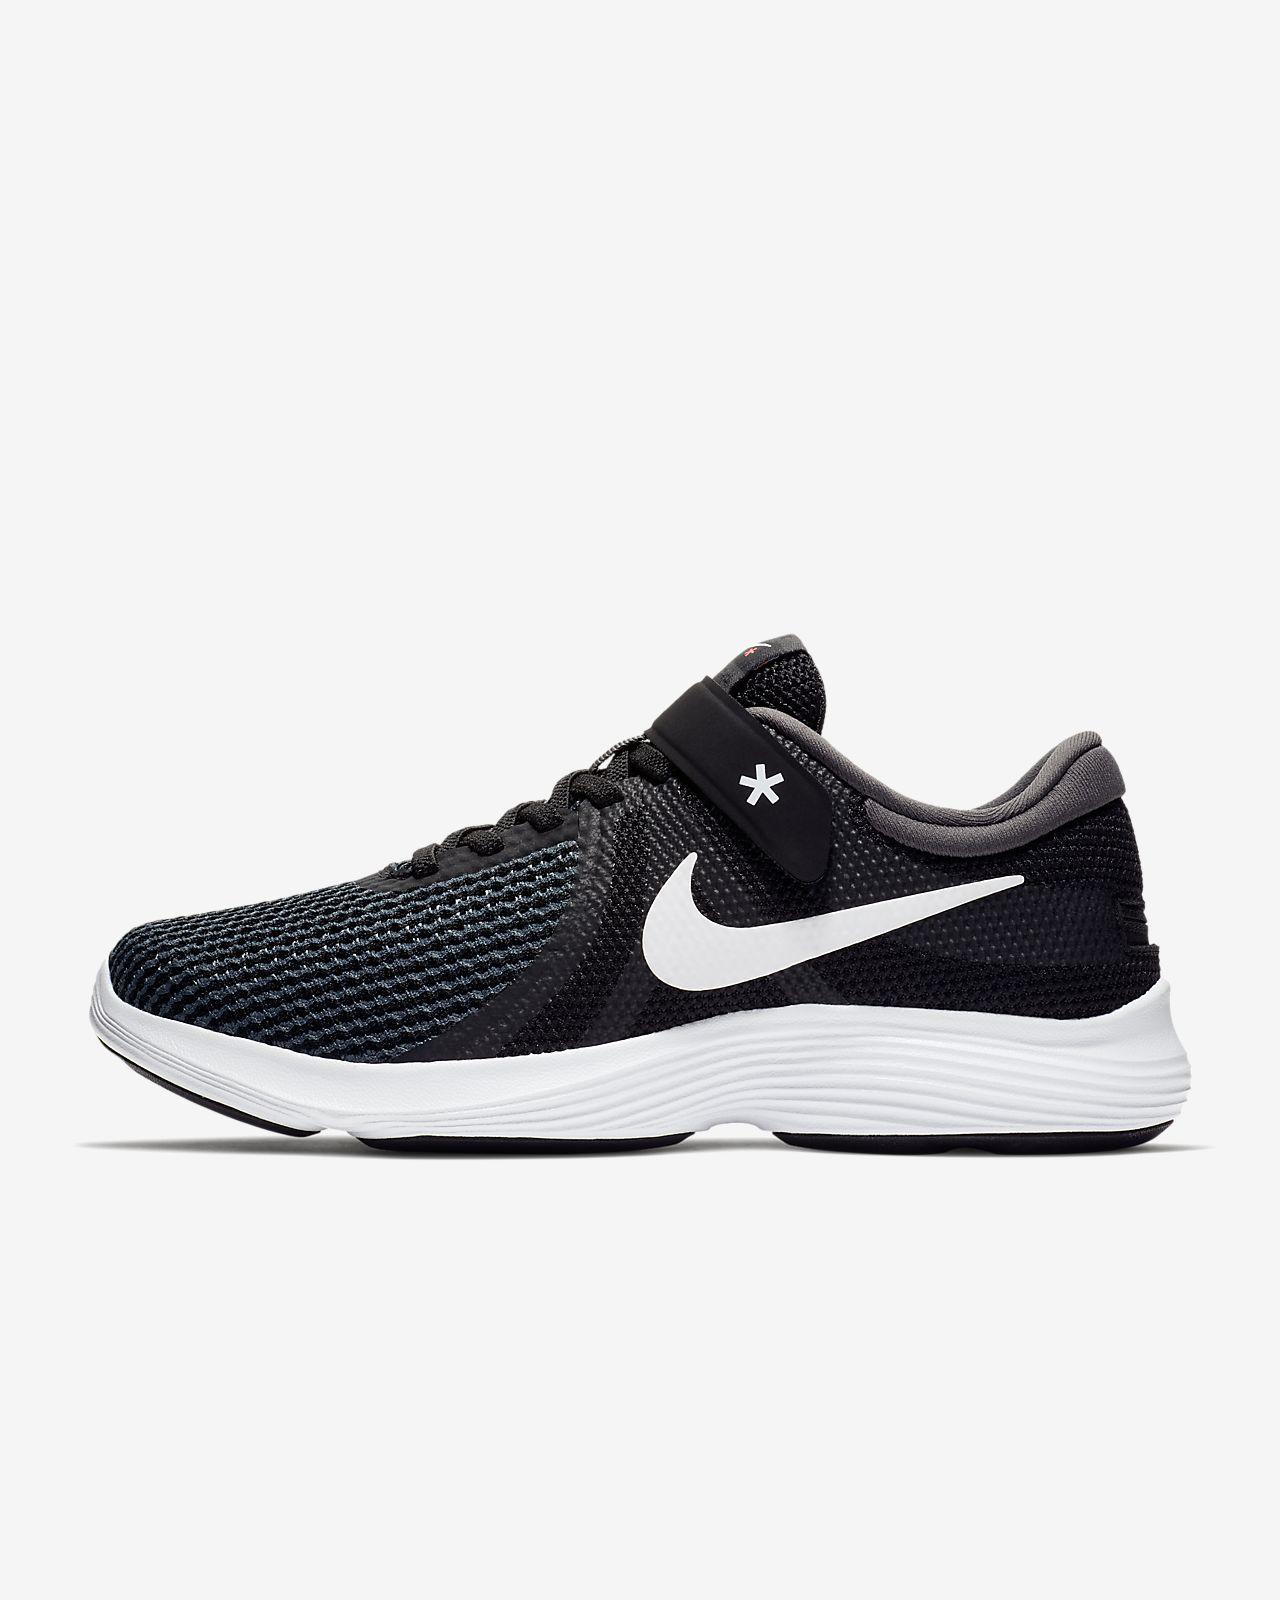 Calzado de running para mujer Nike Revolution 4 FlyEase